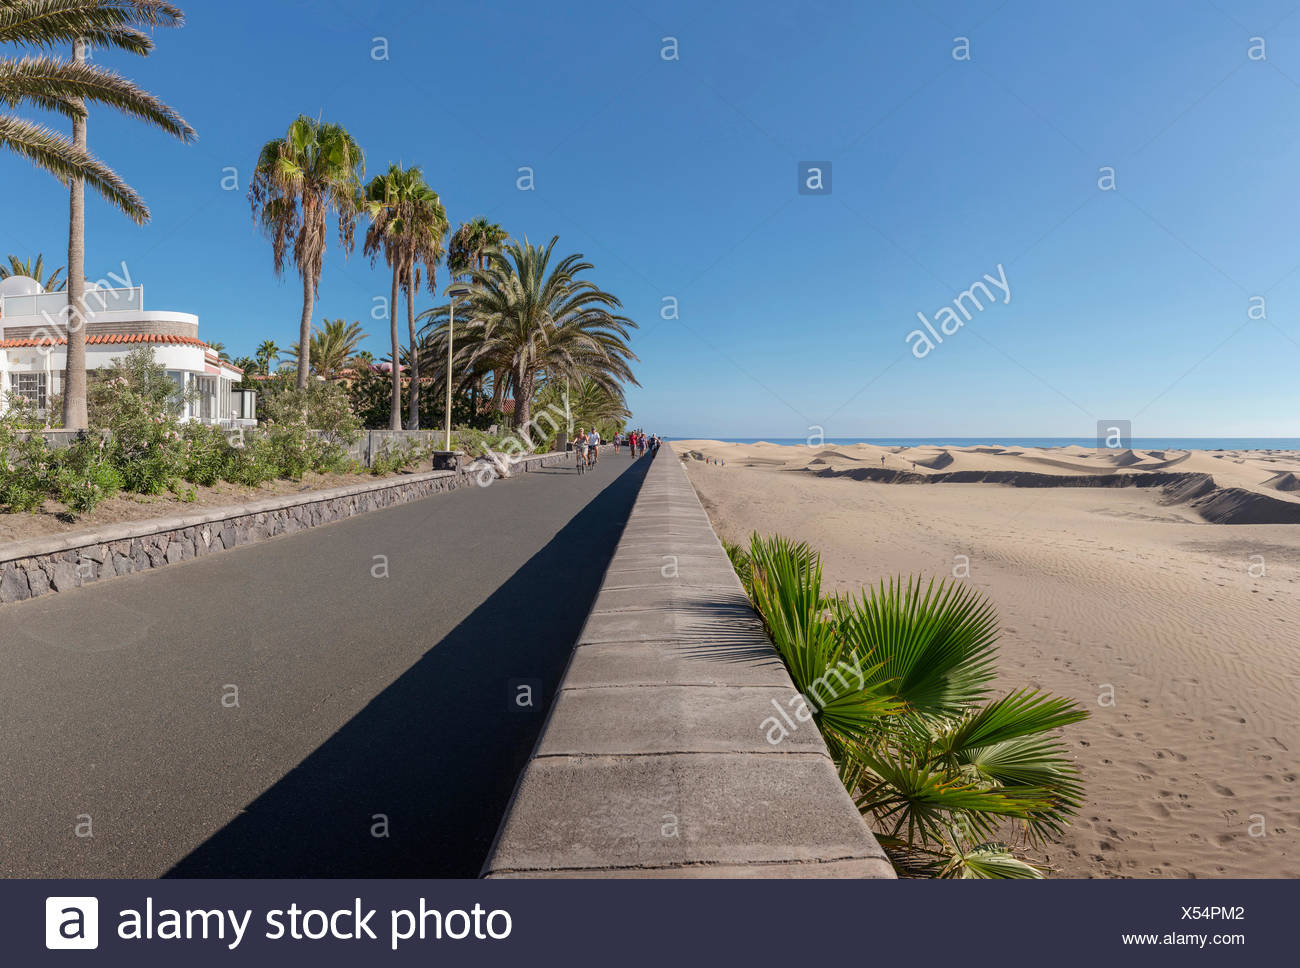 Spanien, Europa, Playa del Ingles, Gran Canaria, Kanarische Inseln, Paseo Costa Canario, Landschaft, Wald, Holz, Bäume, Sommer, beac Stockbild